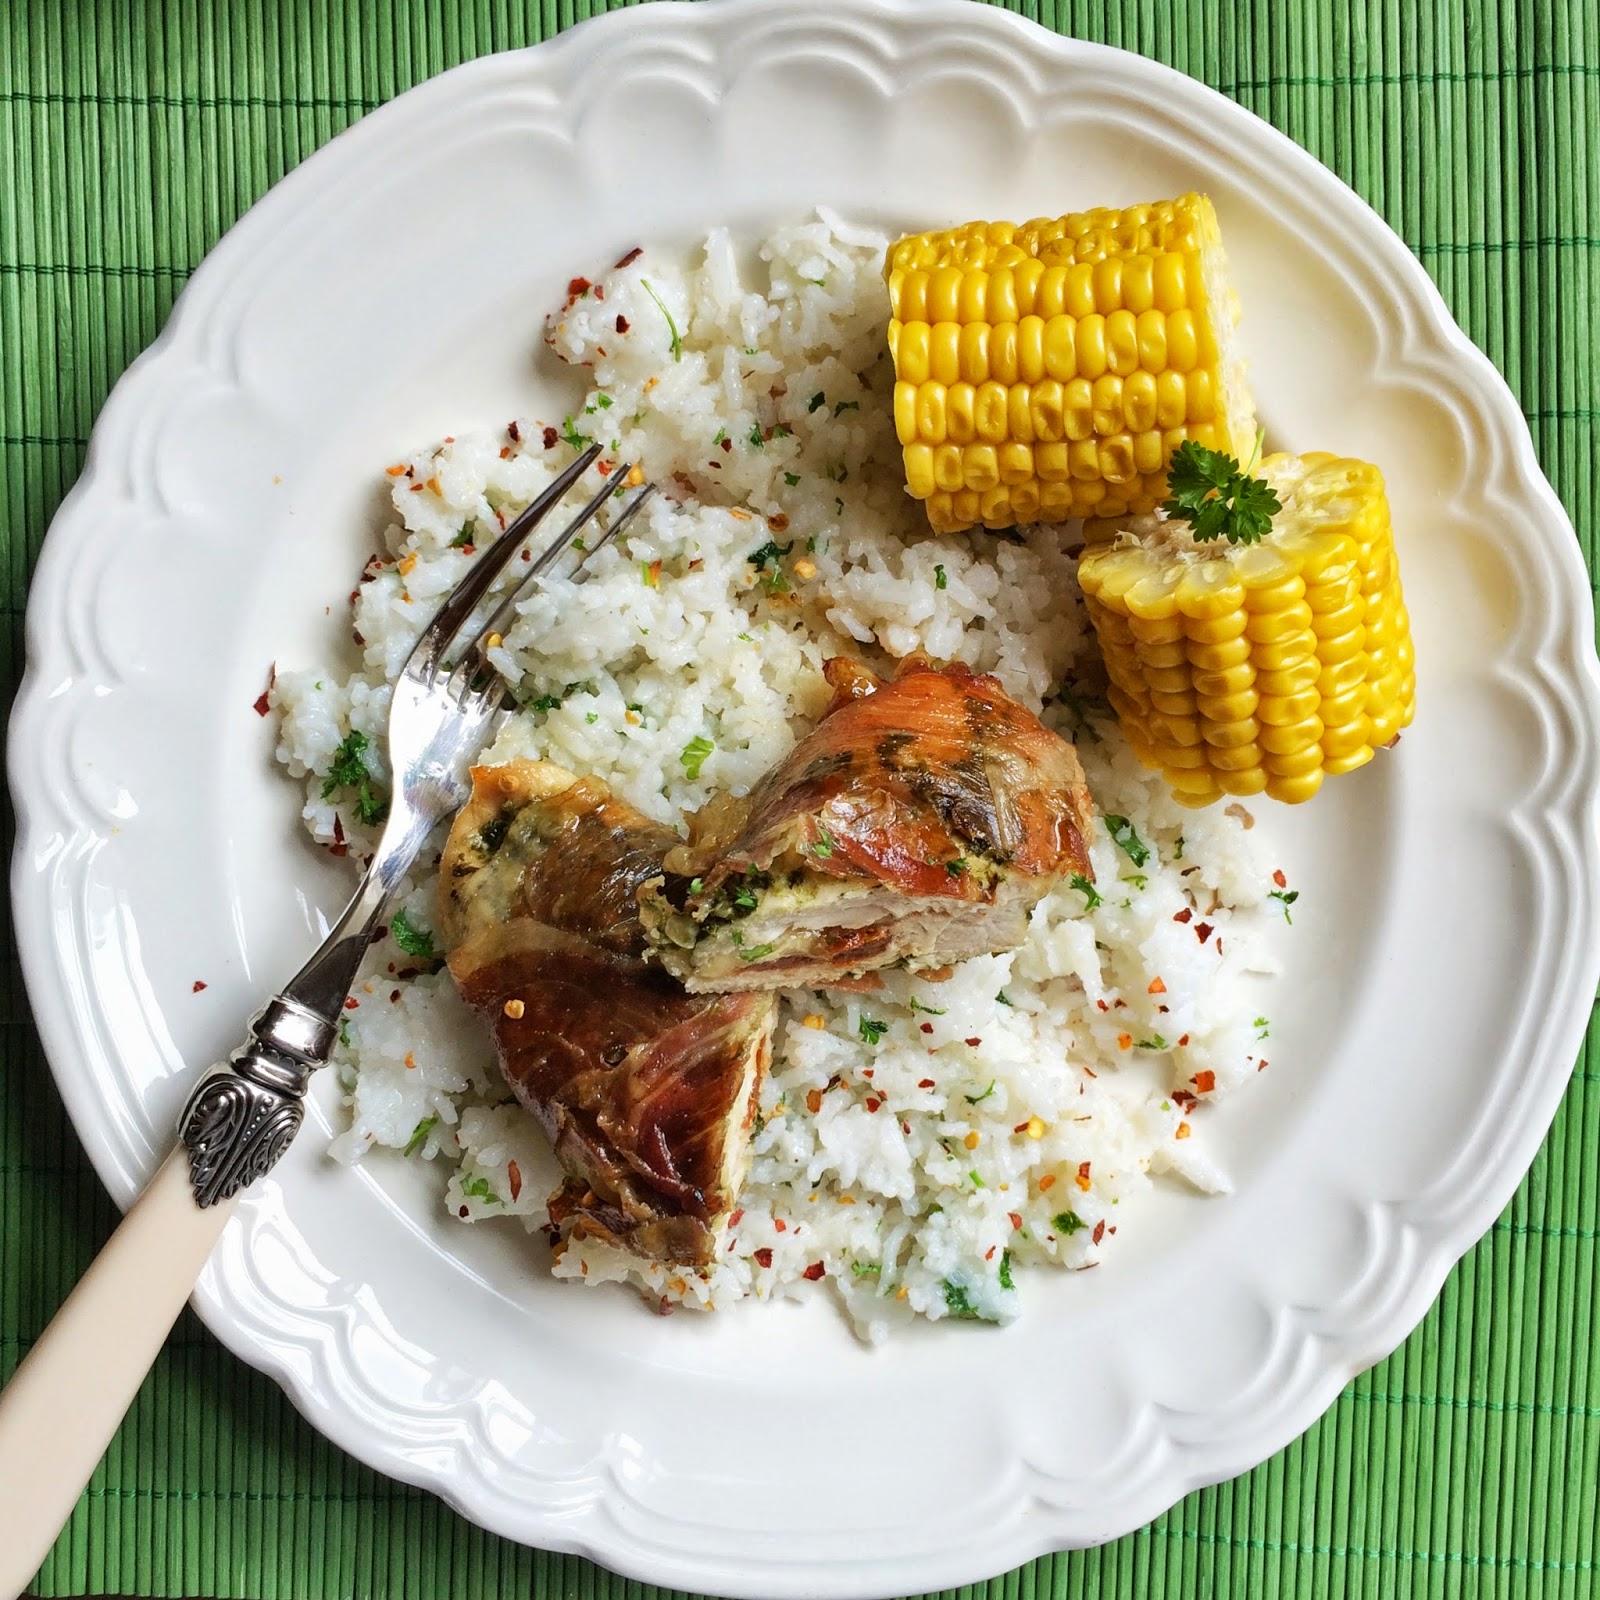 piers kurczaka, szynka parmenska, pesto, ptysiu mietowy